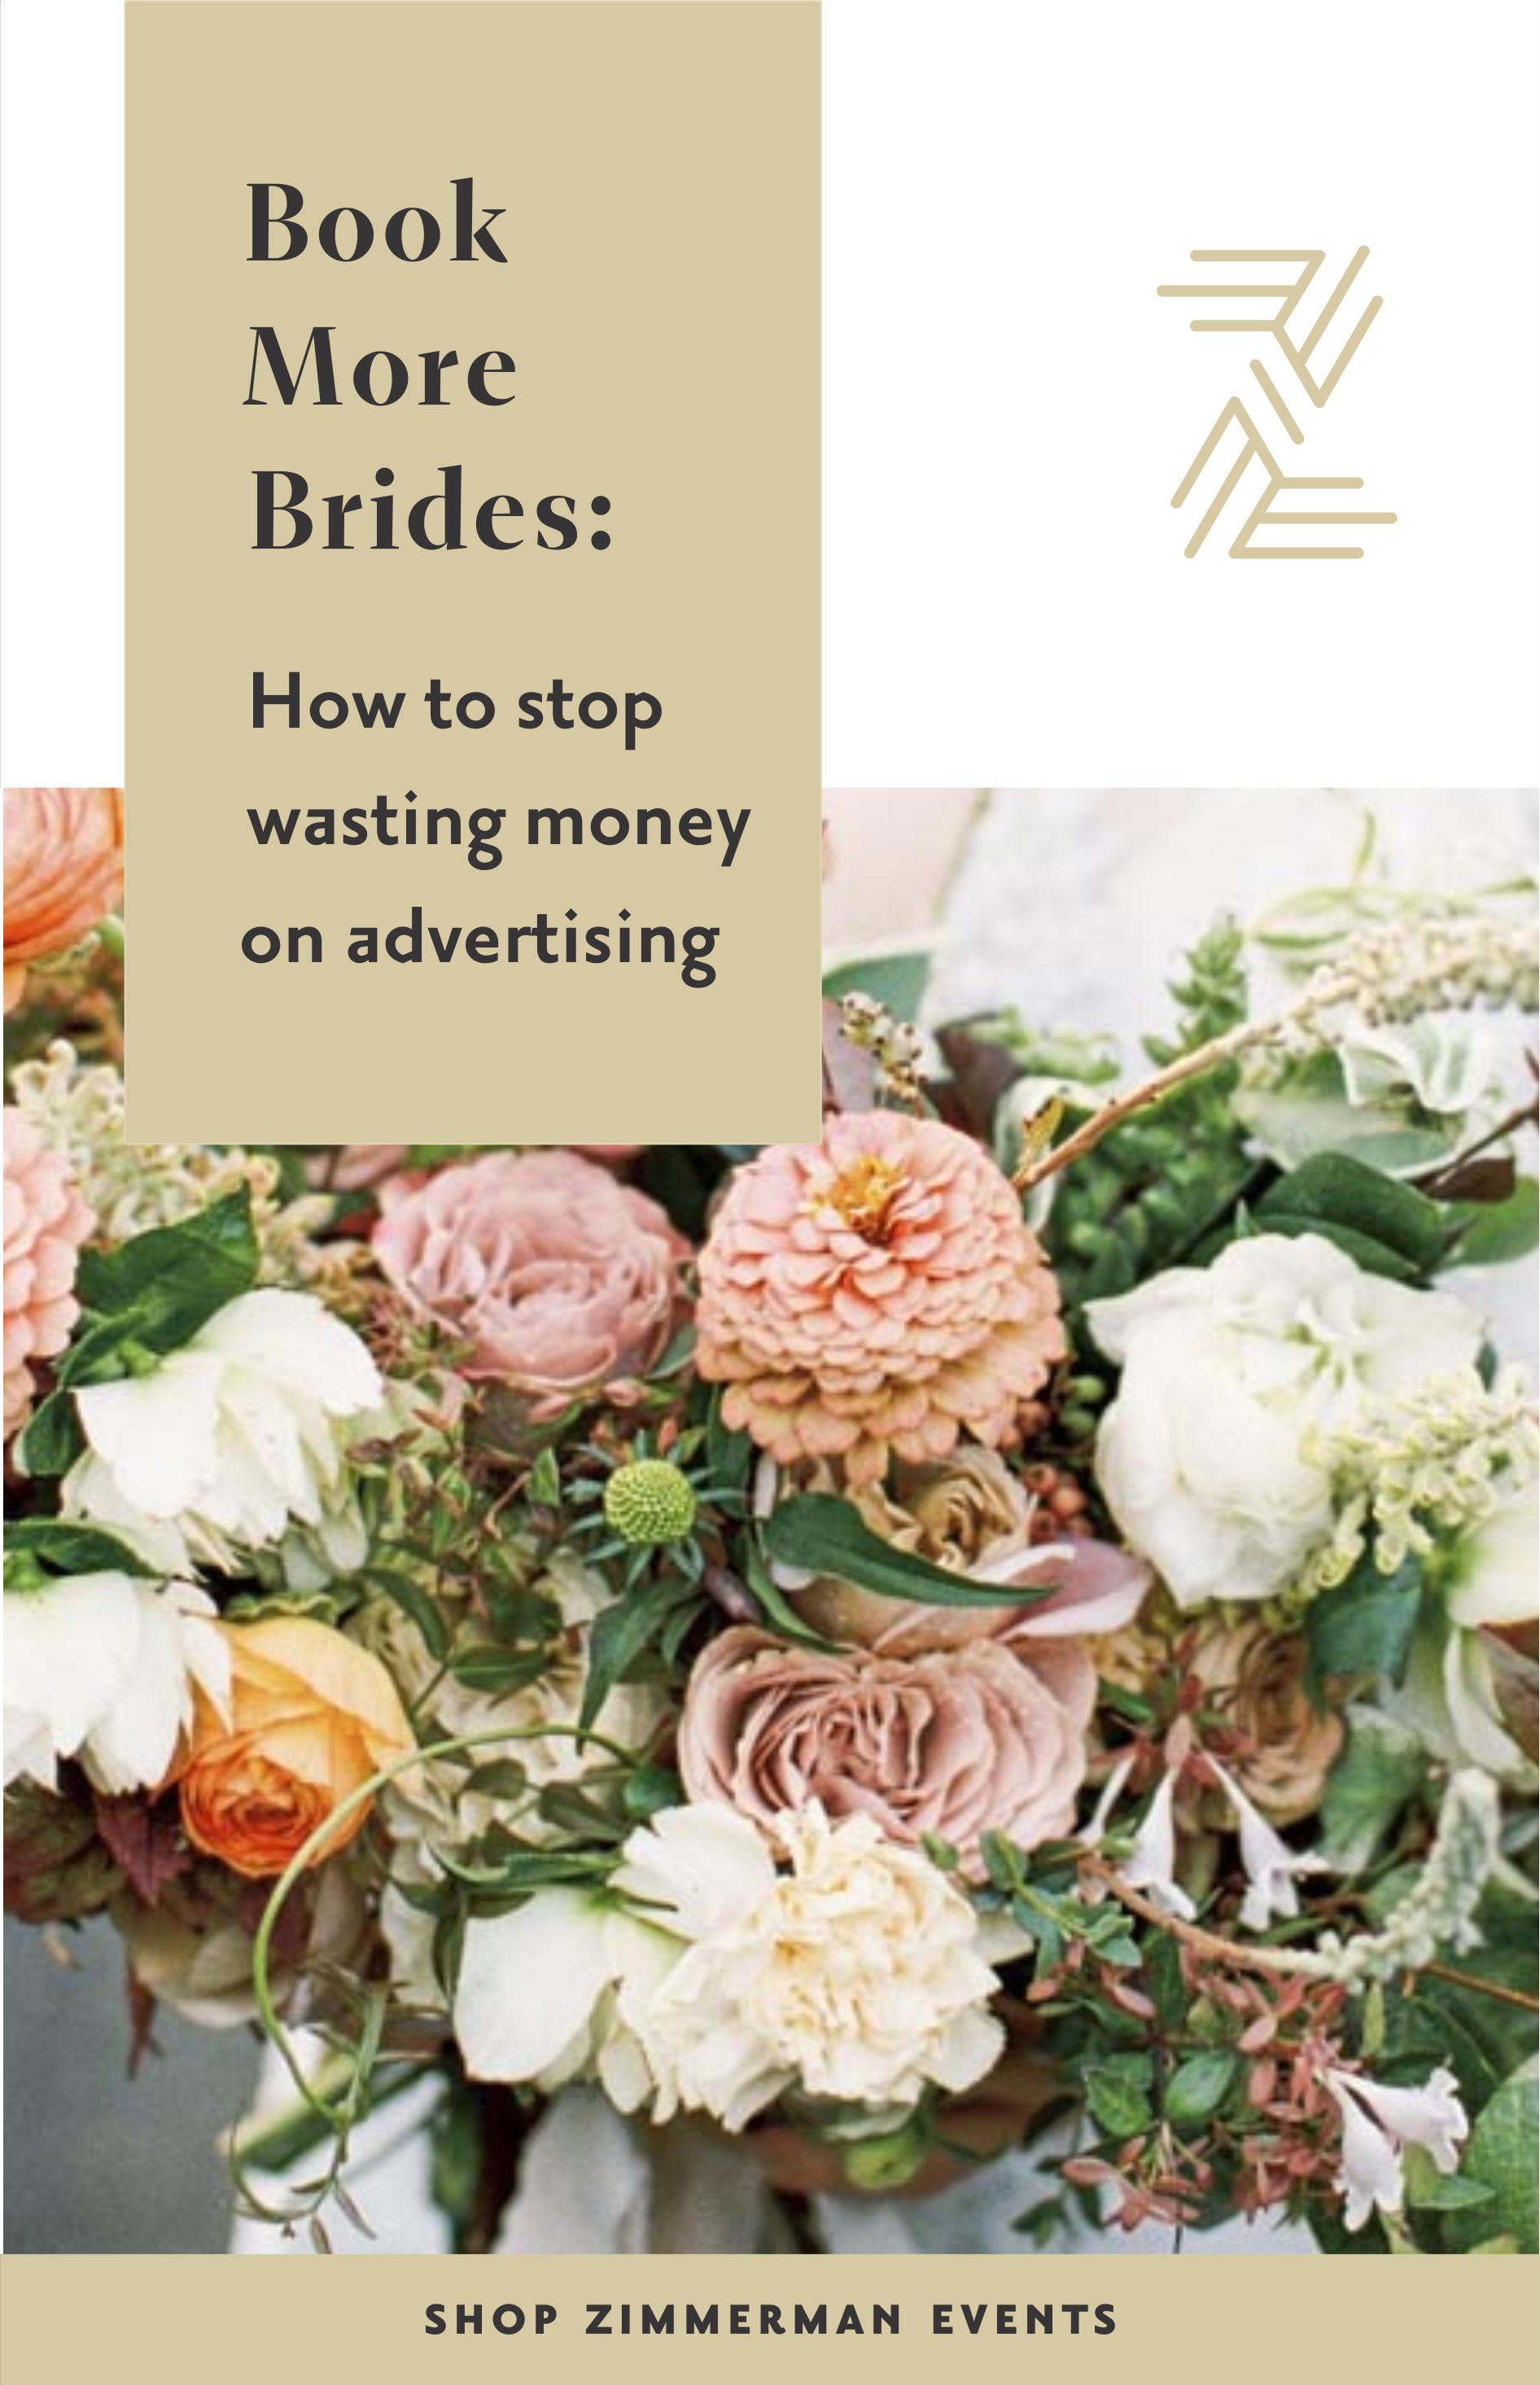 Video Tutorial How To Stop Wasting Money On Advertising Arkansas Wedding Planner Florist Education Zimmerman Wedding Business Ideas Wedding Business Floral Design Business